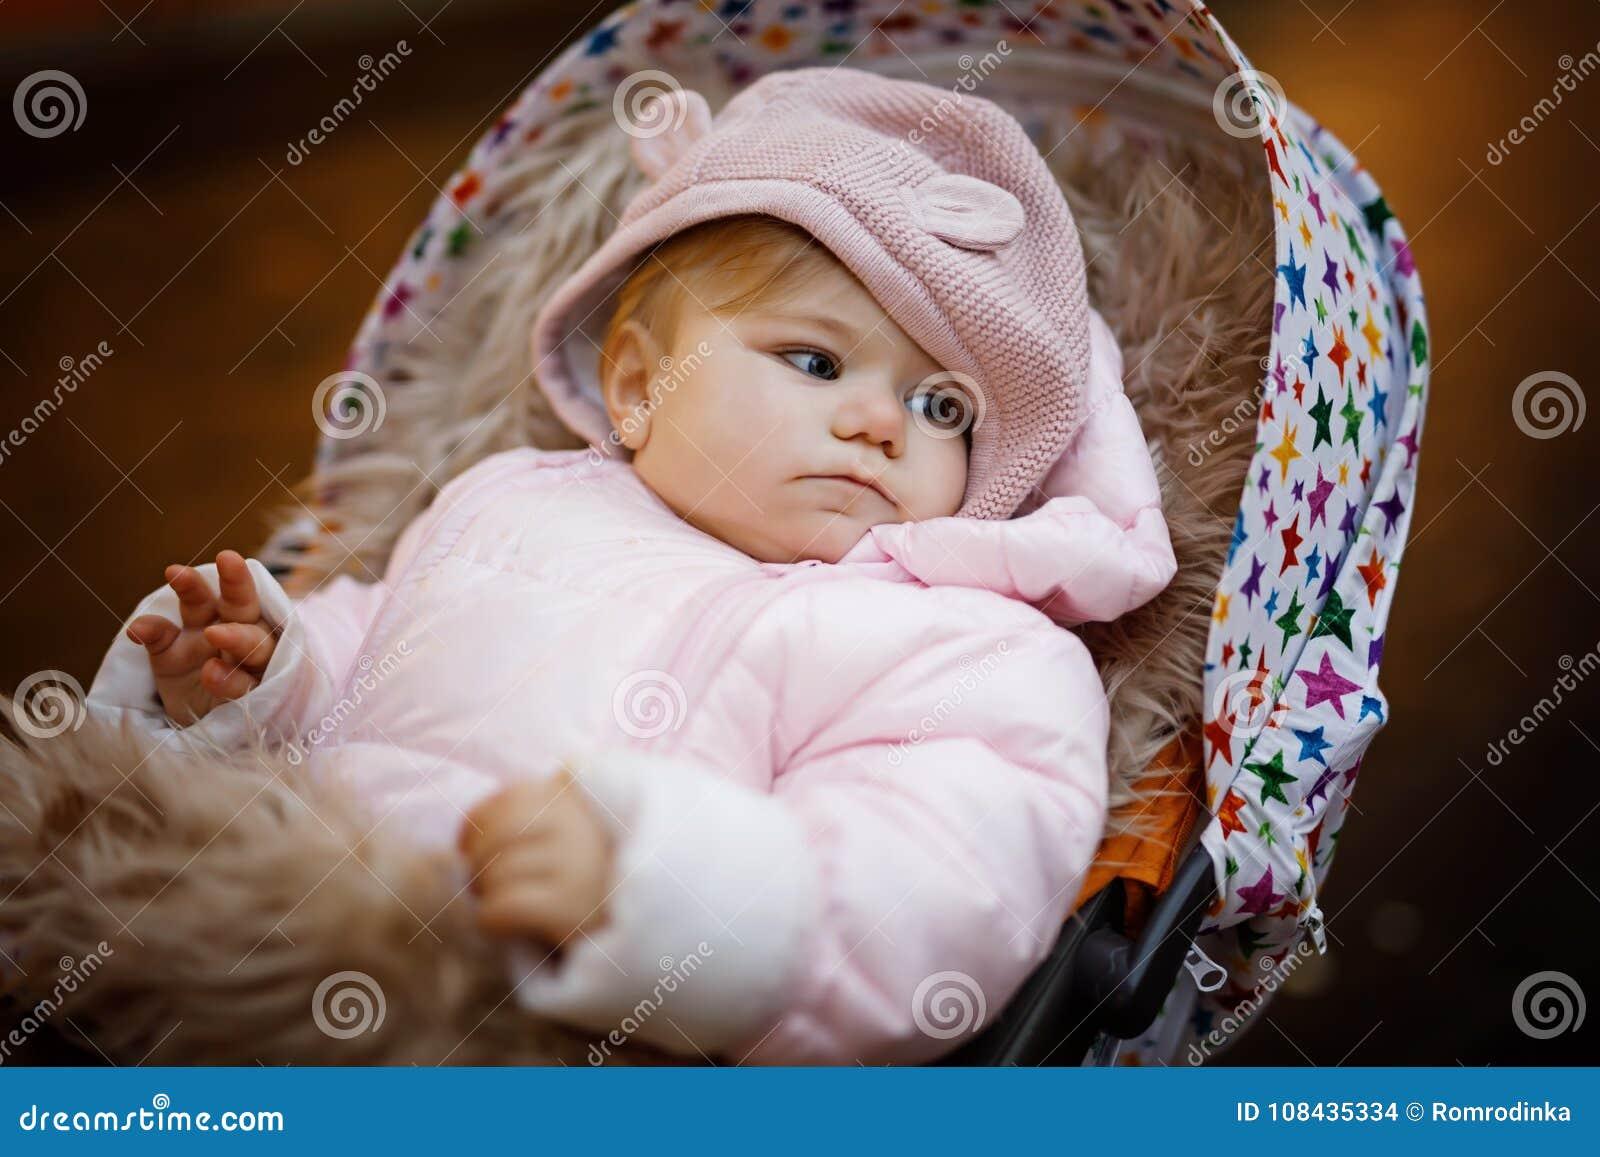 1786fe38b6d8 Cute Little Beautiful Baby Girl Sitting In The Pram Or Stroller On ...